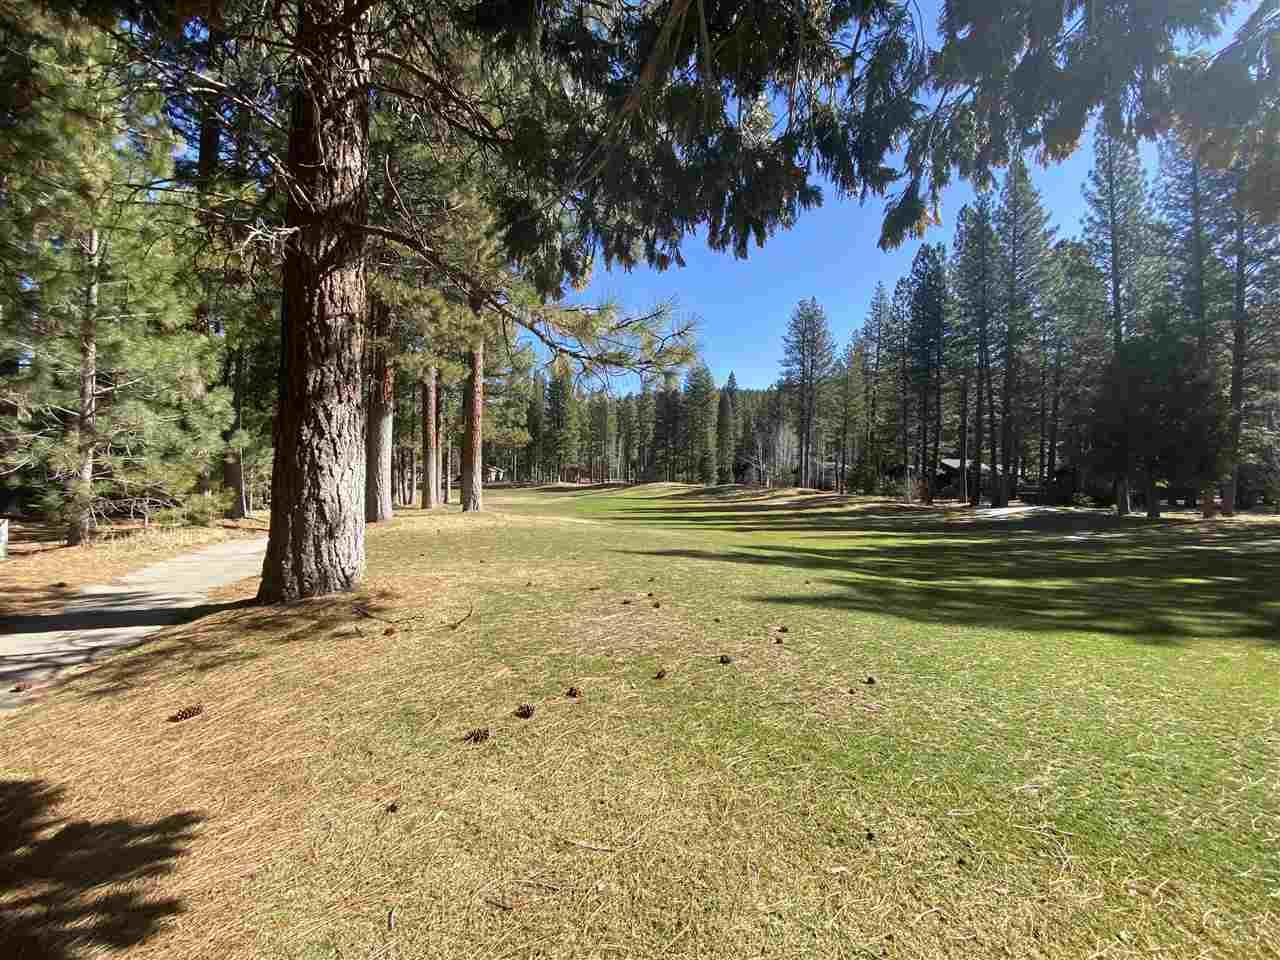 Image for 44 Black Bear Trail, Clio, CA 96106-000